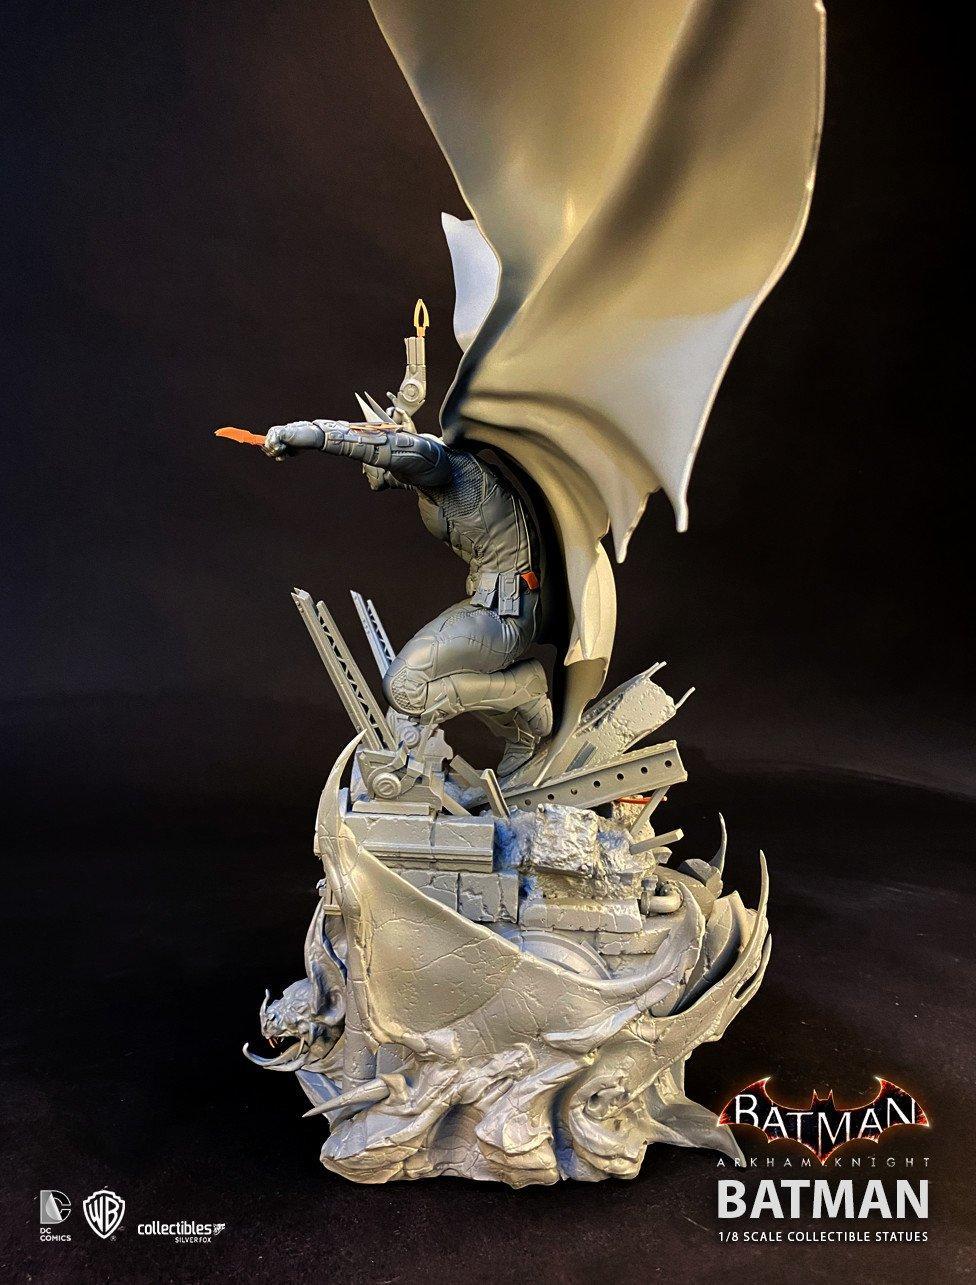 Batman siver fox collectibles batman arkham knight 1 8 scale statue9